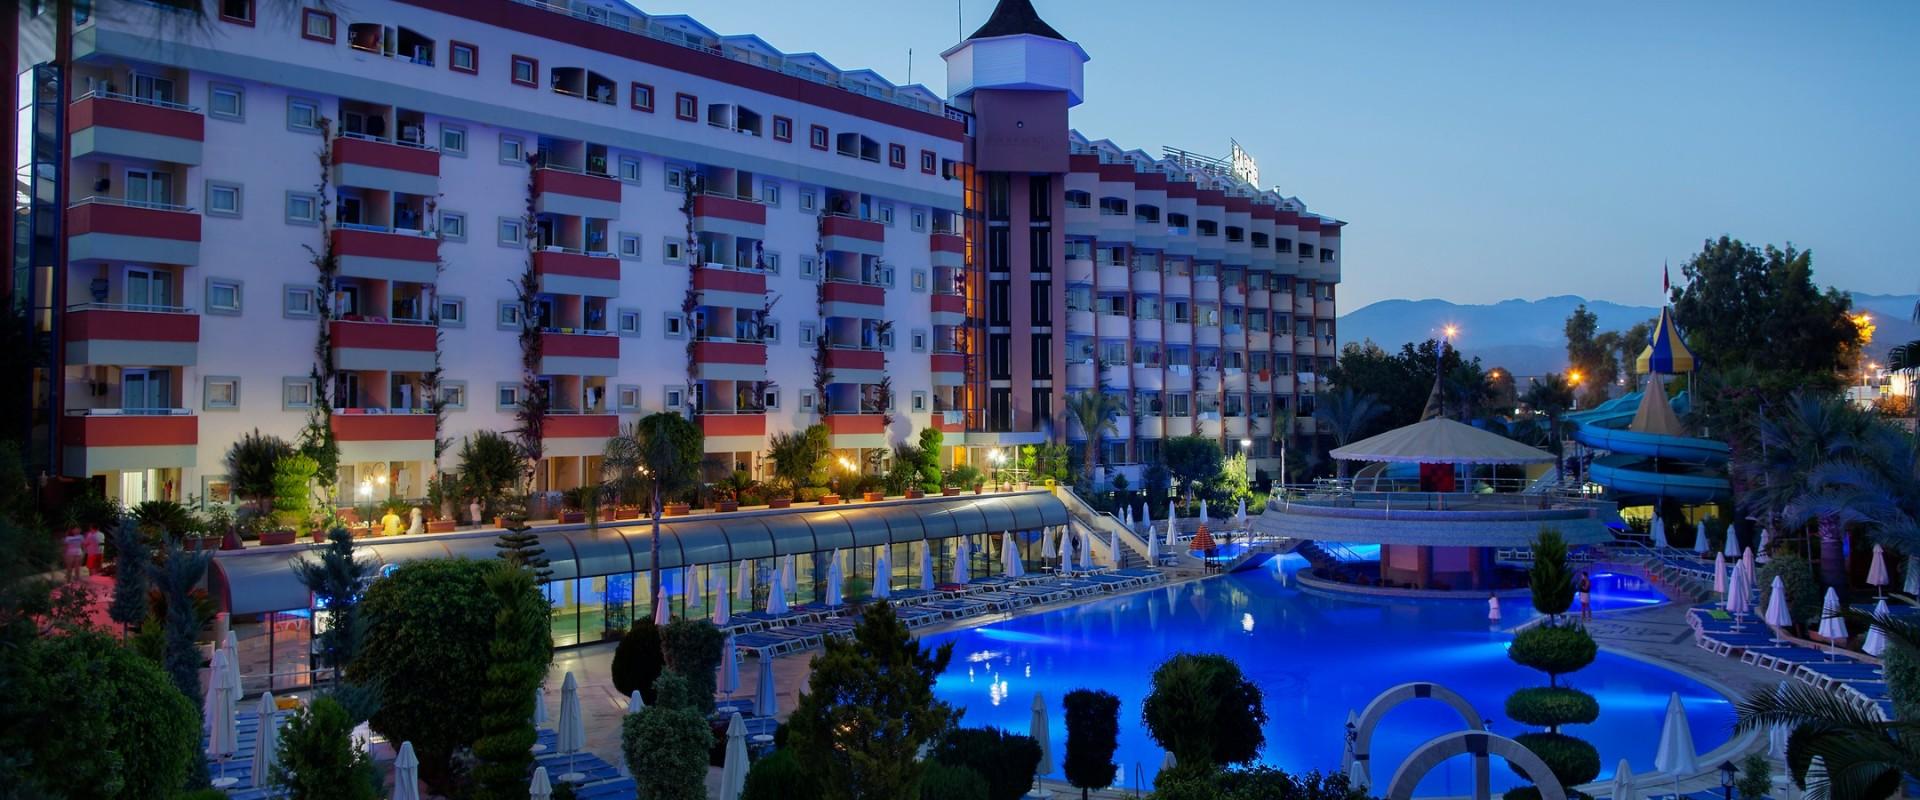 All inclusive în Turcia 2020, Alanya, Hotel Saphir